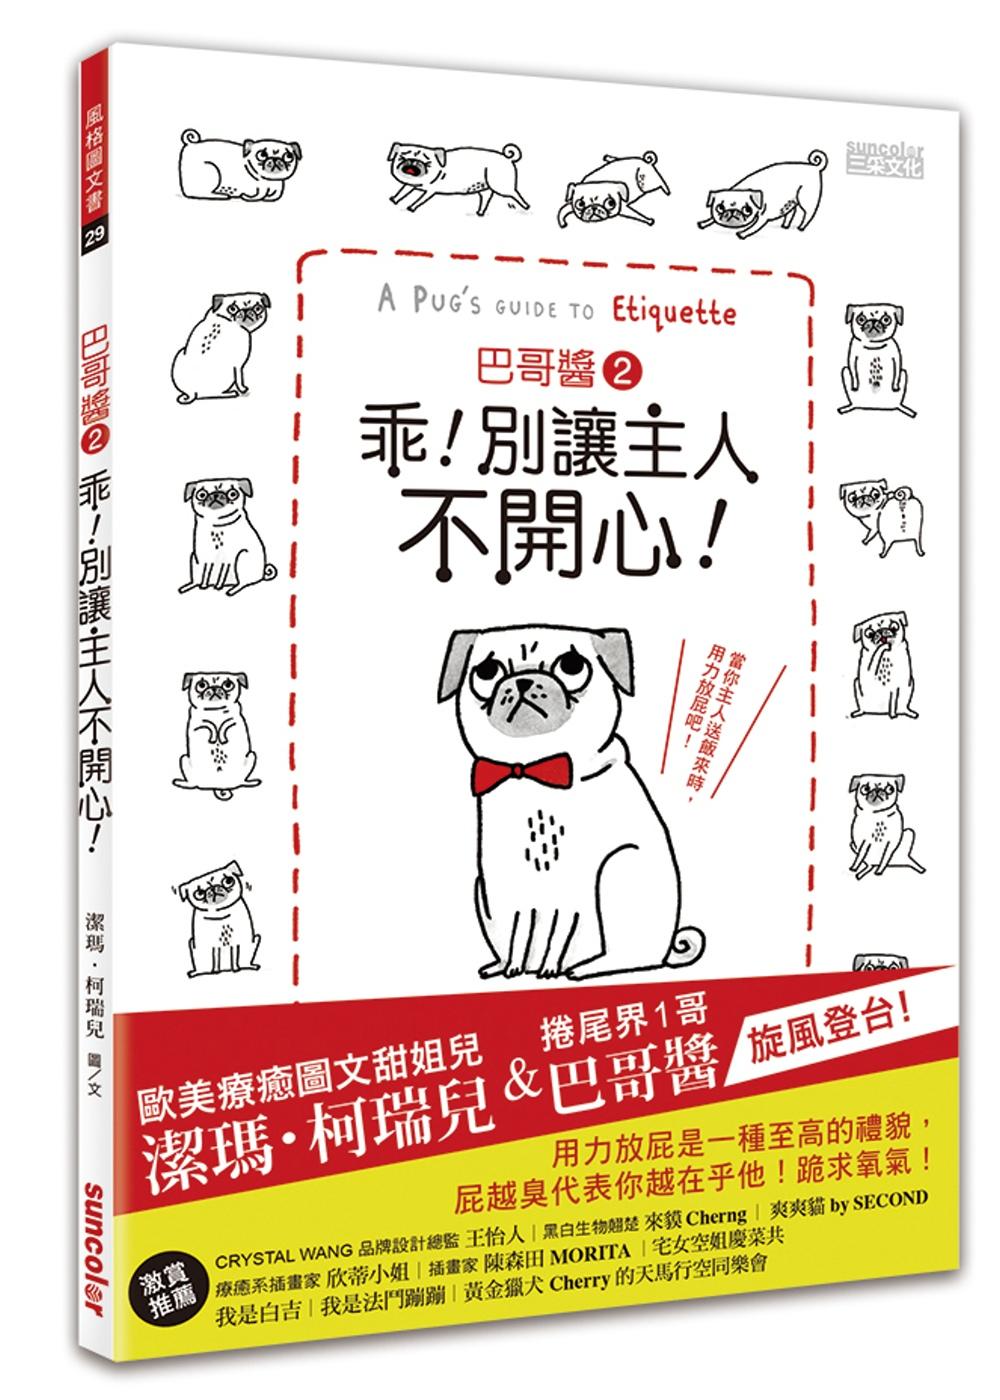 巴哥醬2:乖!別讓主人不開心!A Pug's Guide to Etiquette